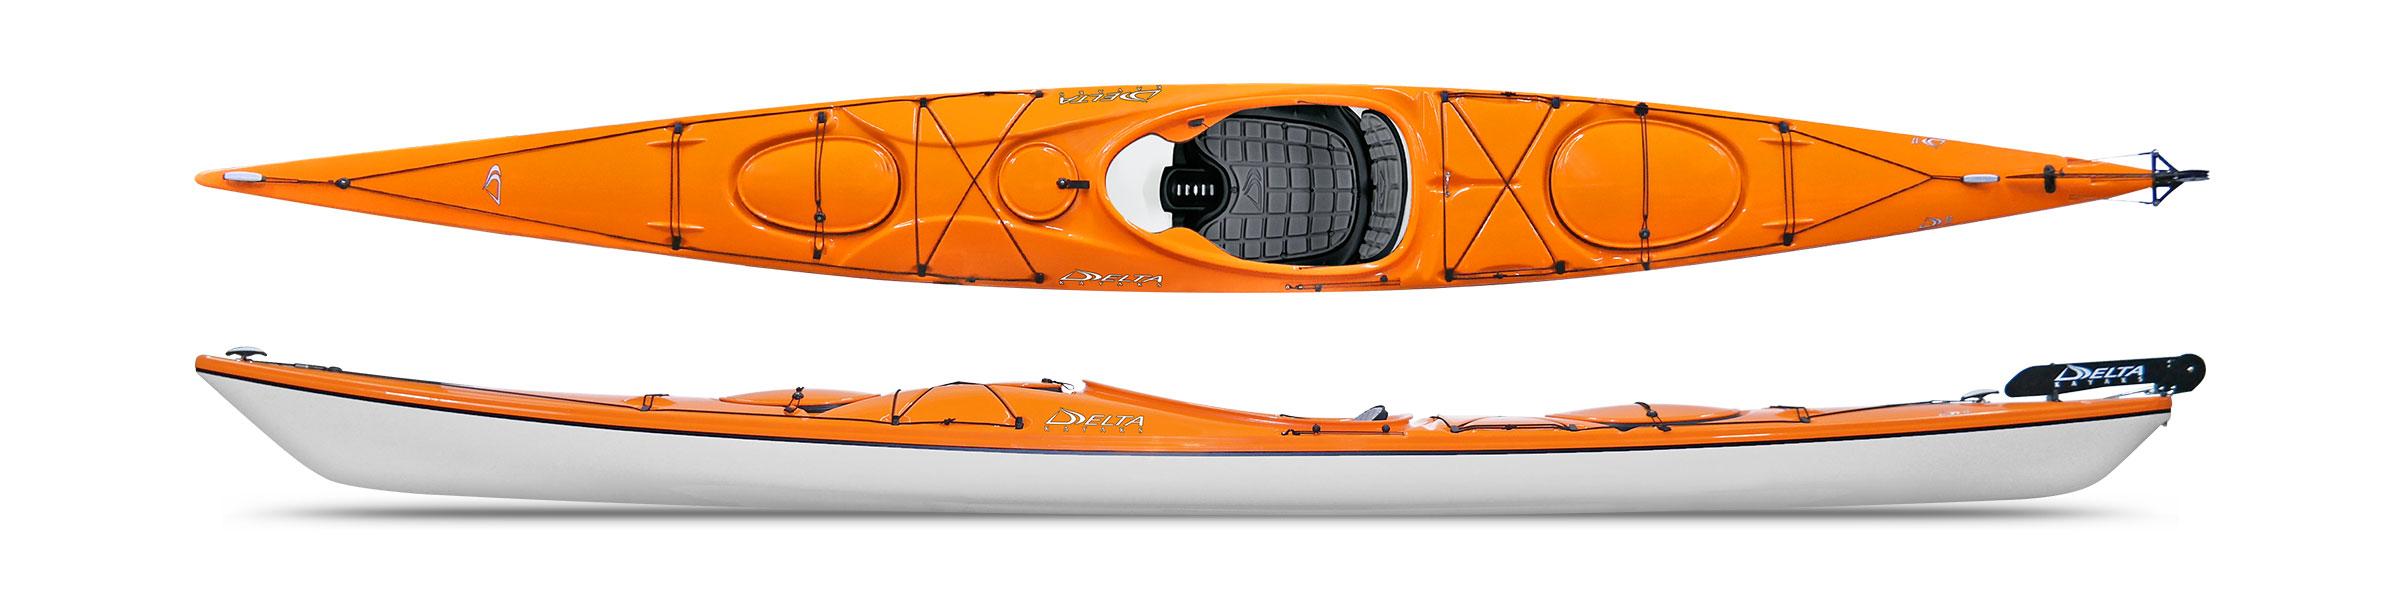 DELTA 17 with rudder - Winnipeg Canoe & Kayak Rentals